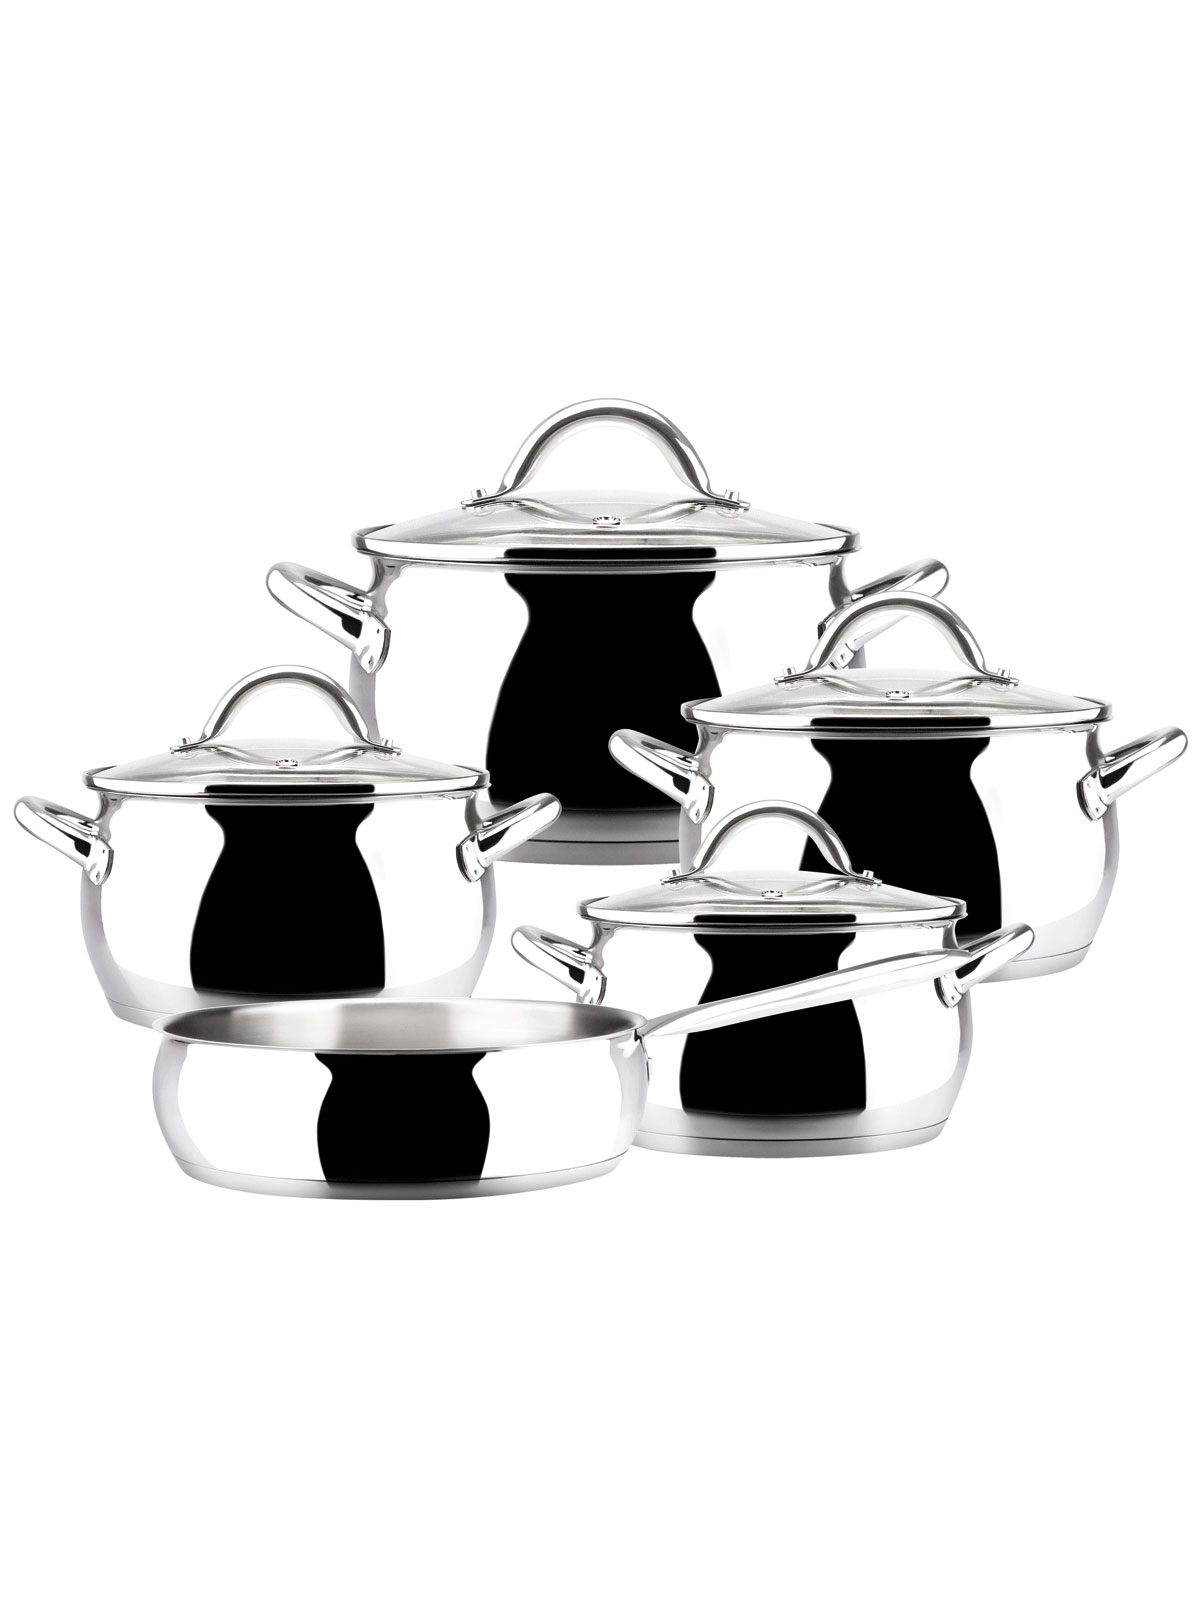 Bater a de cocina kuchen 9 piezas menajeando for Iber baterias de cocina